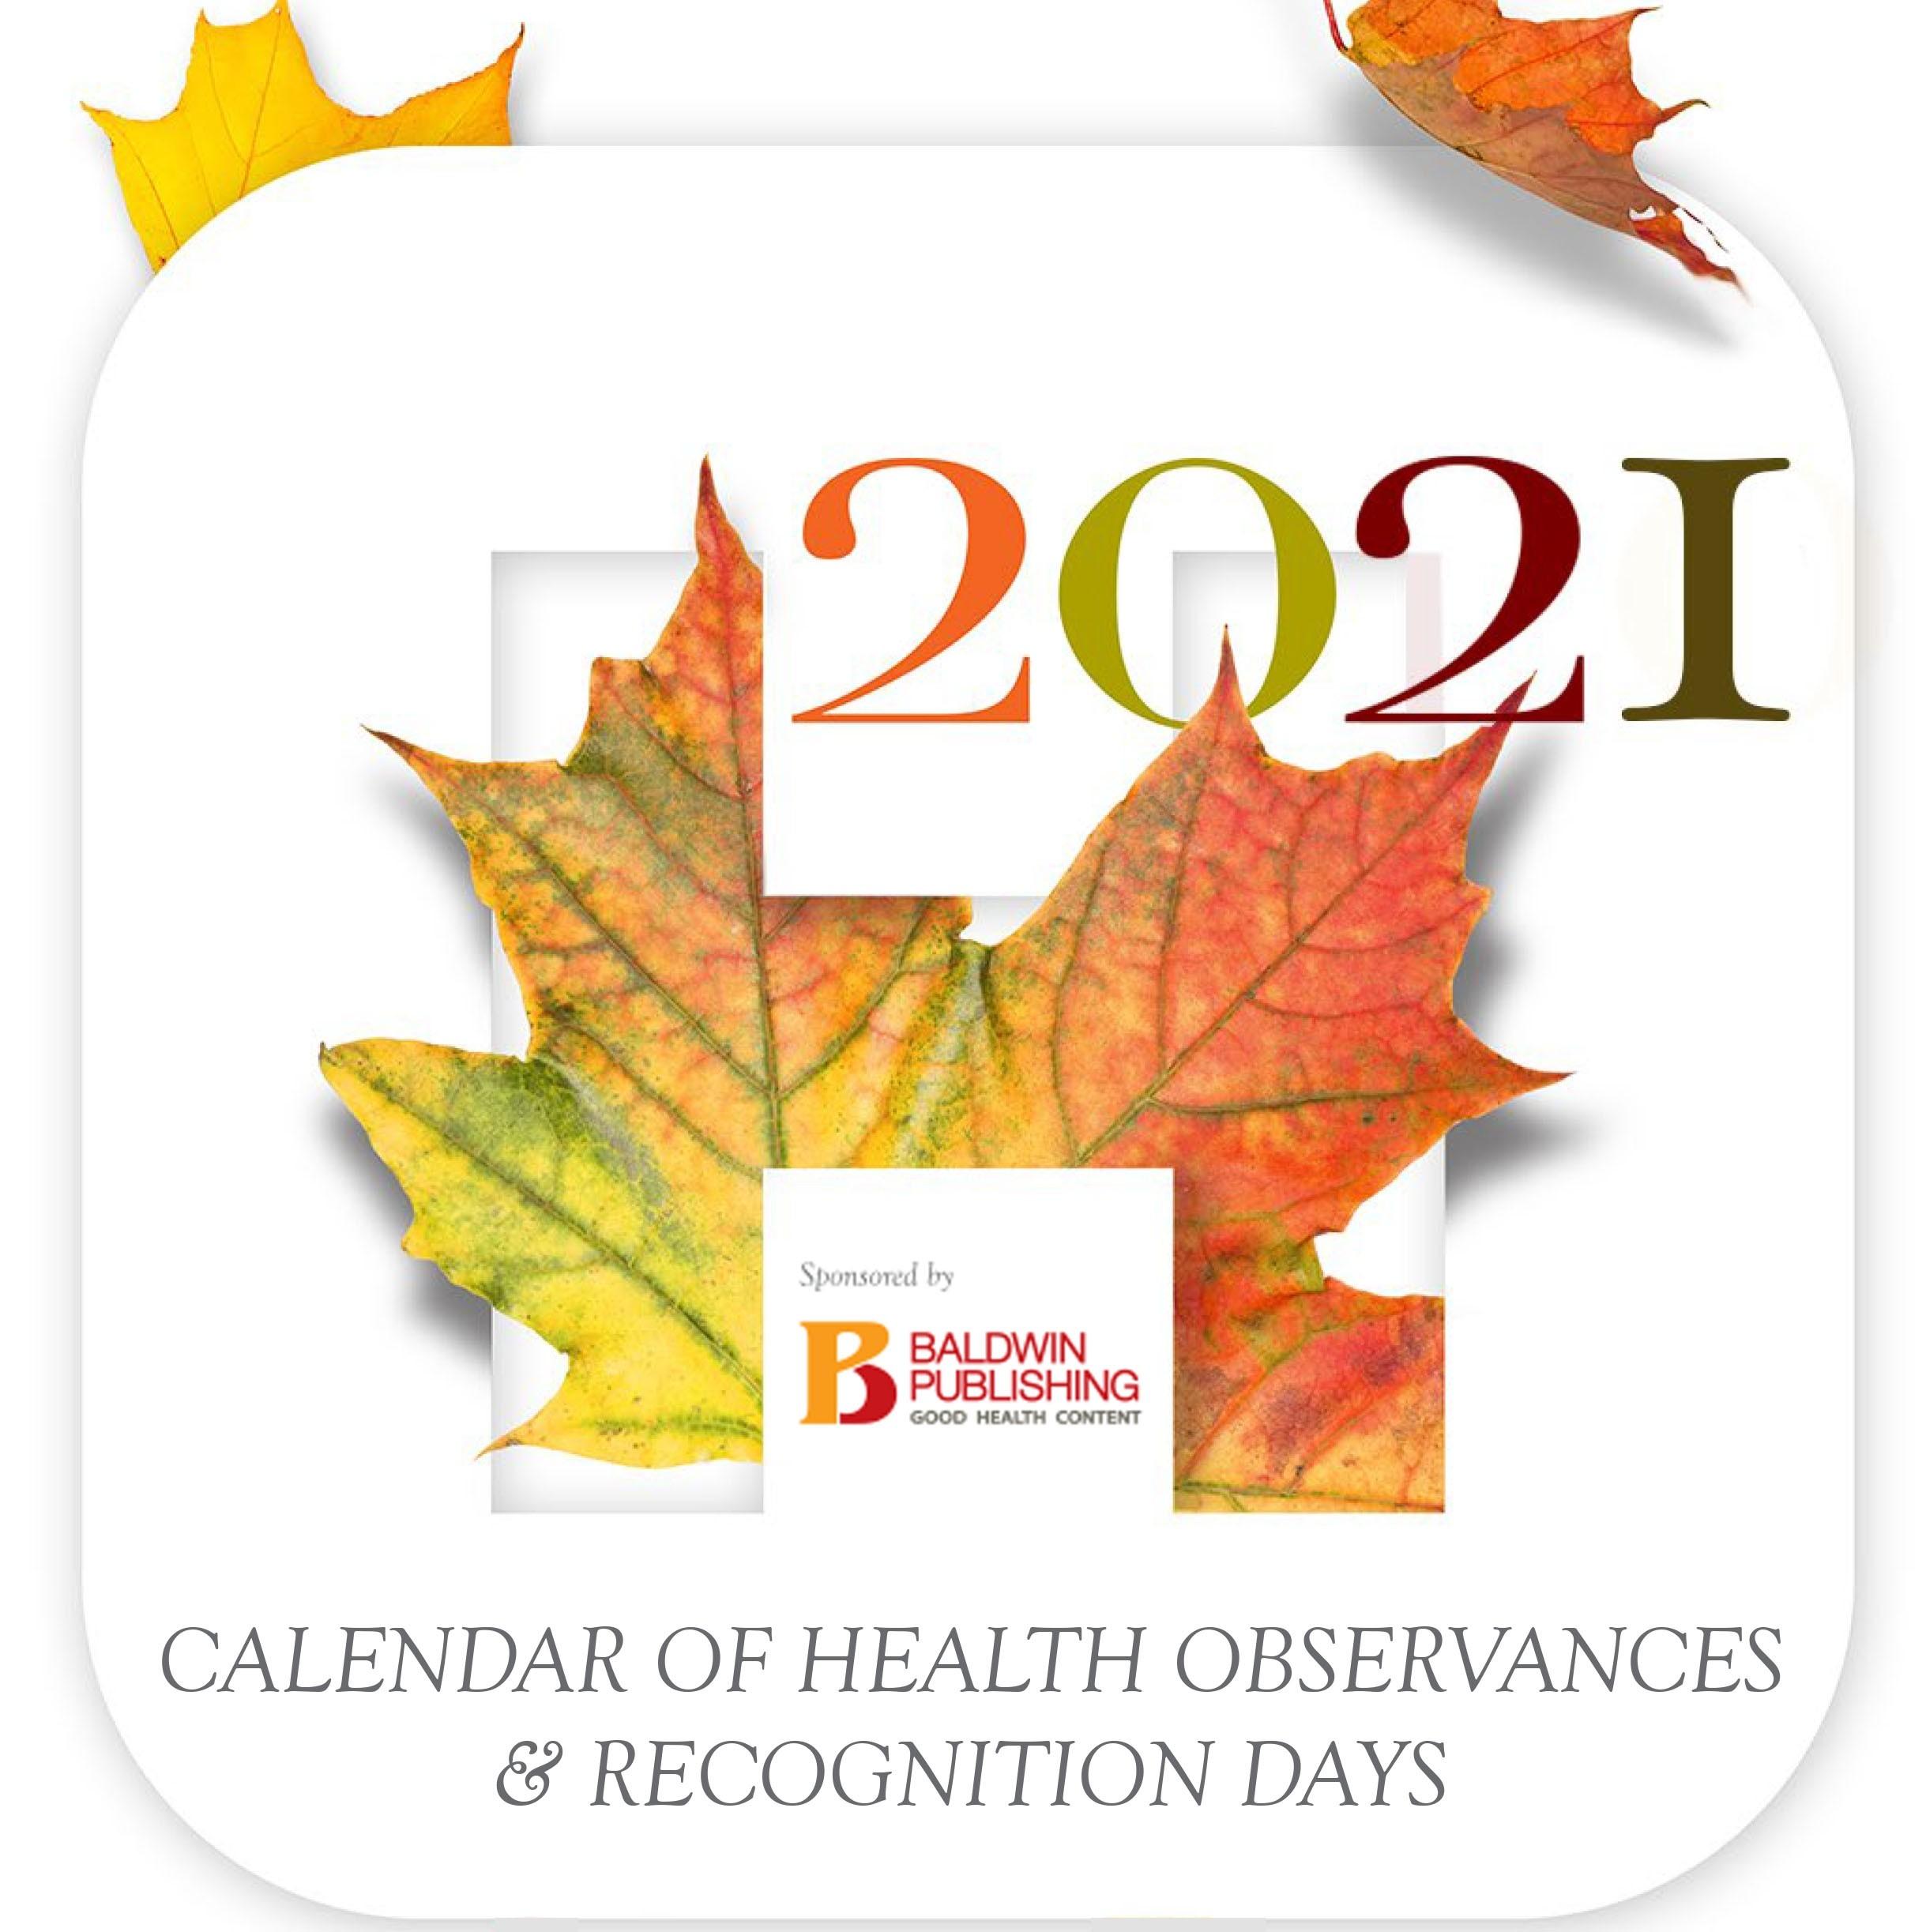 Baldwin Publishing Sponsors 2021 Health Observances Calendar  Healthcare Recognition 2021